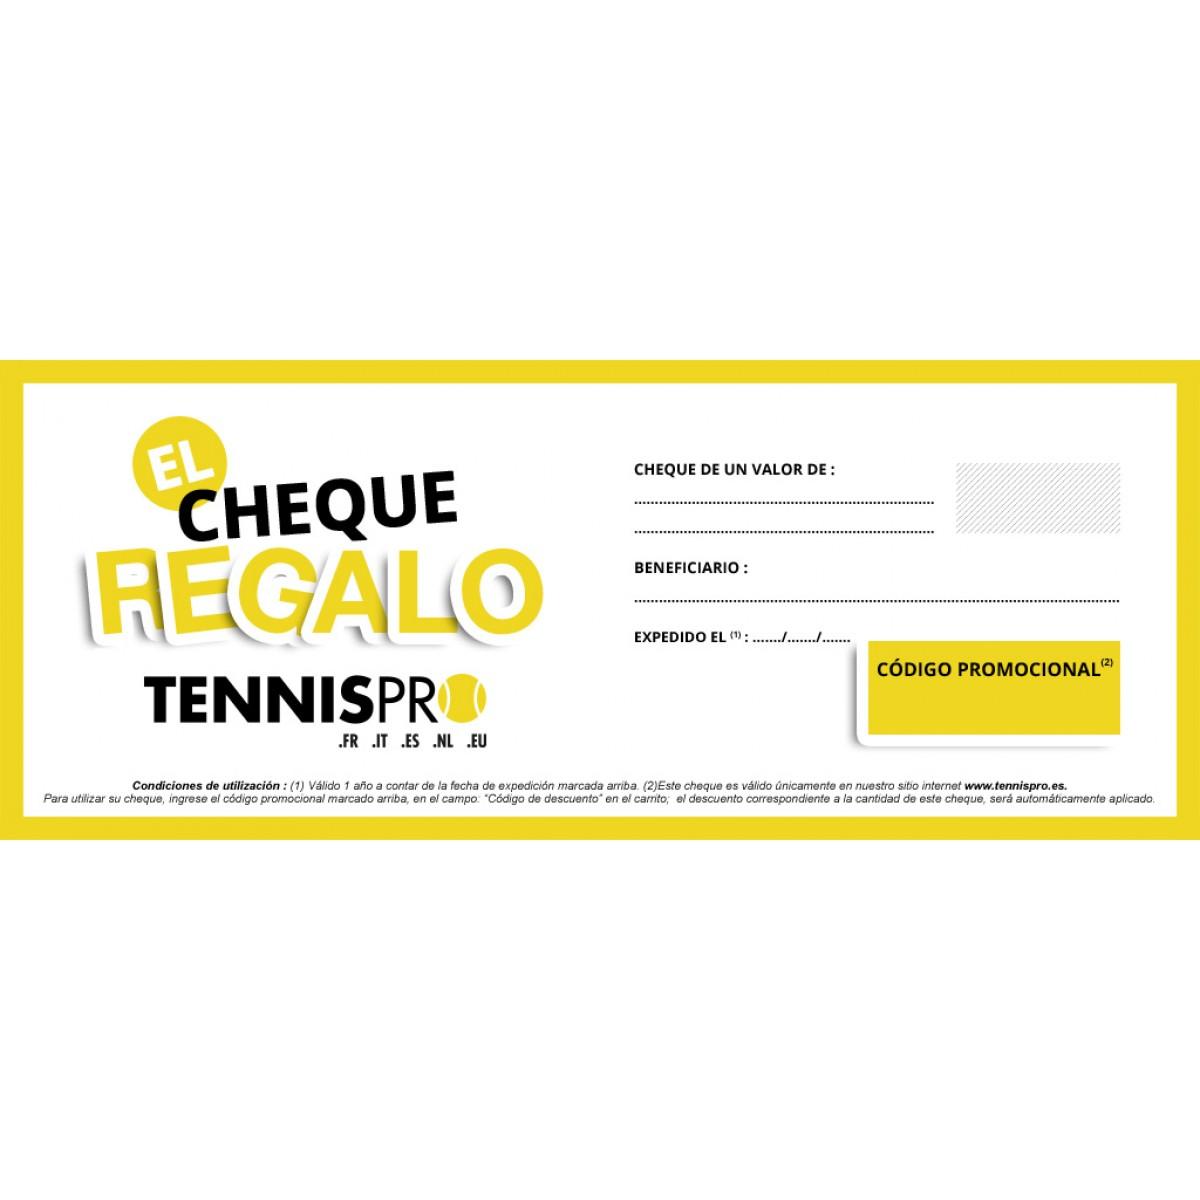 CHEQUE REGALO TENNISPRO